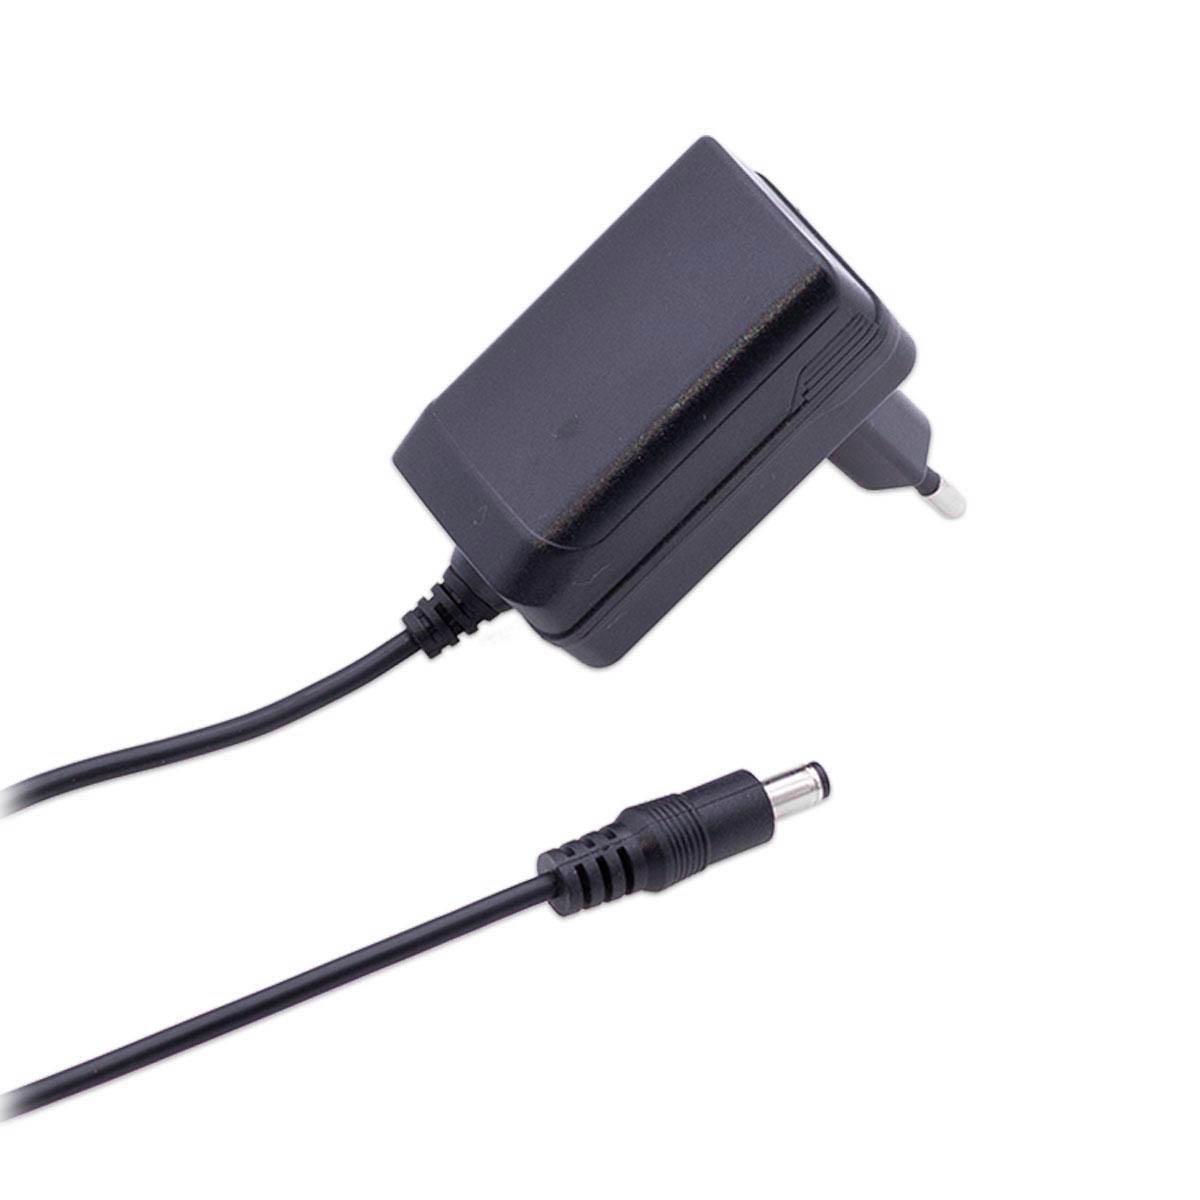 Steckernetzteil 24W 12V 2A Hohlstecker 5.5/2.1mm EU-Plug Festspannung